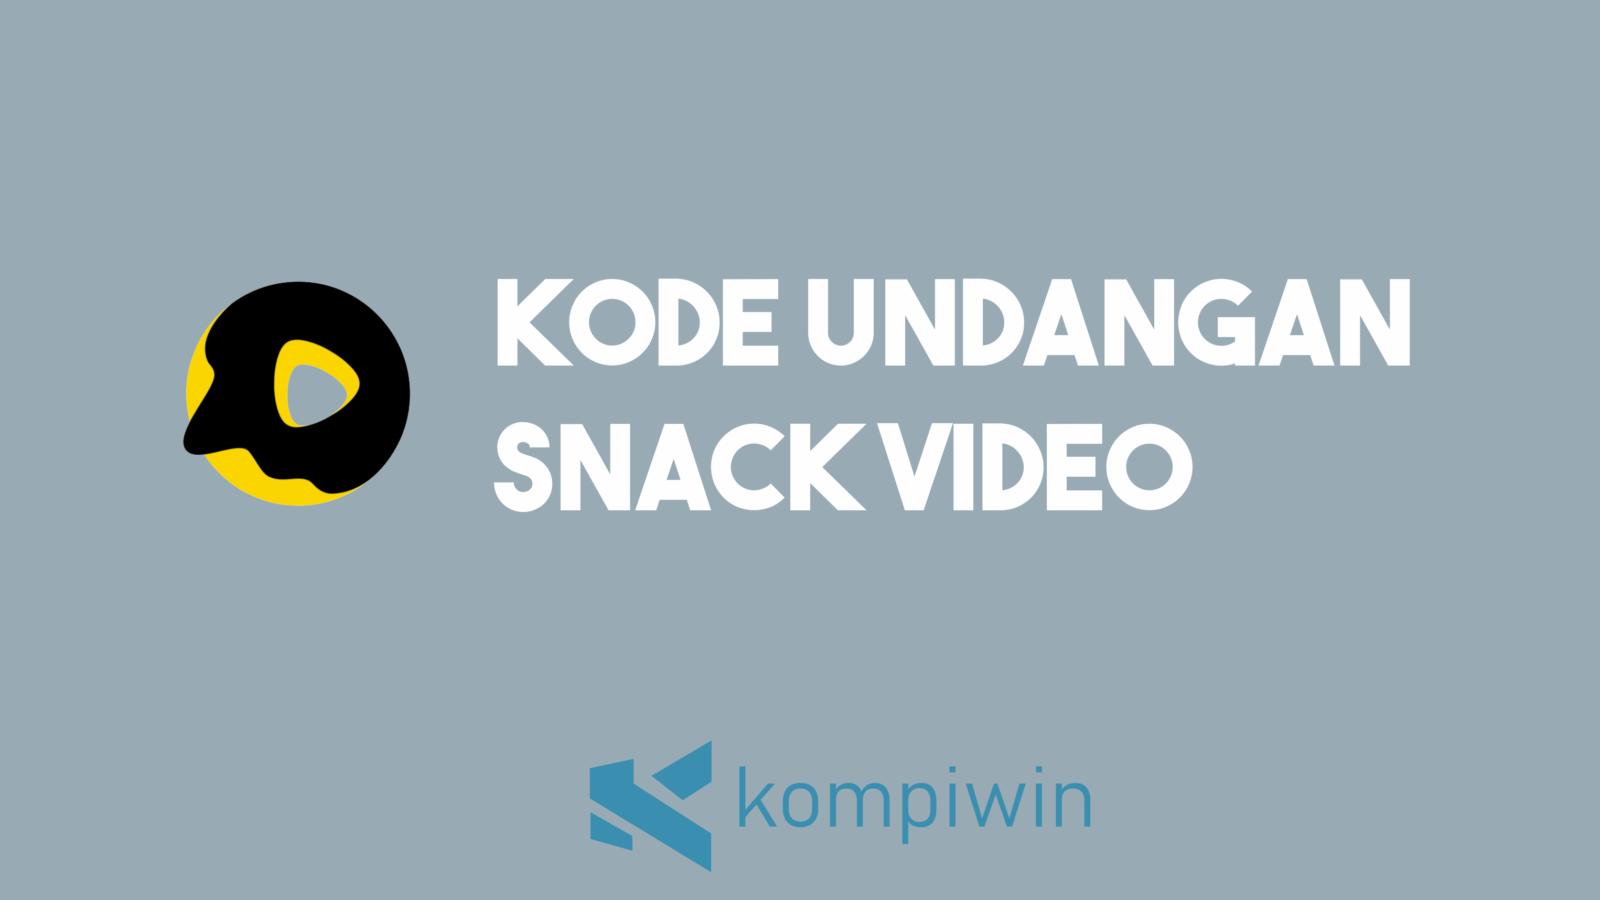 Kode Undangan Snack Video 7